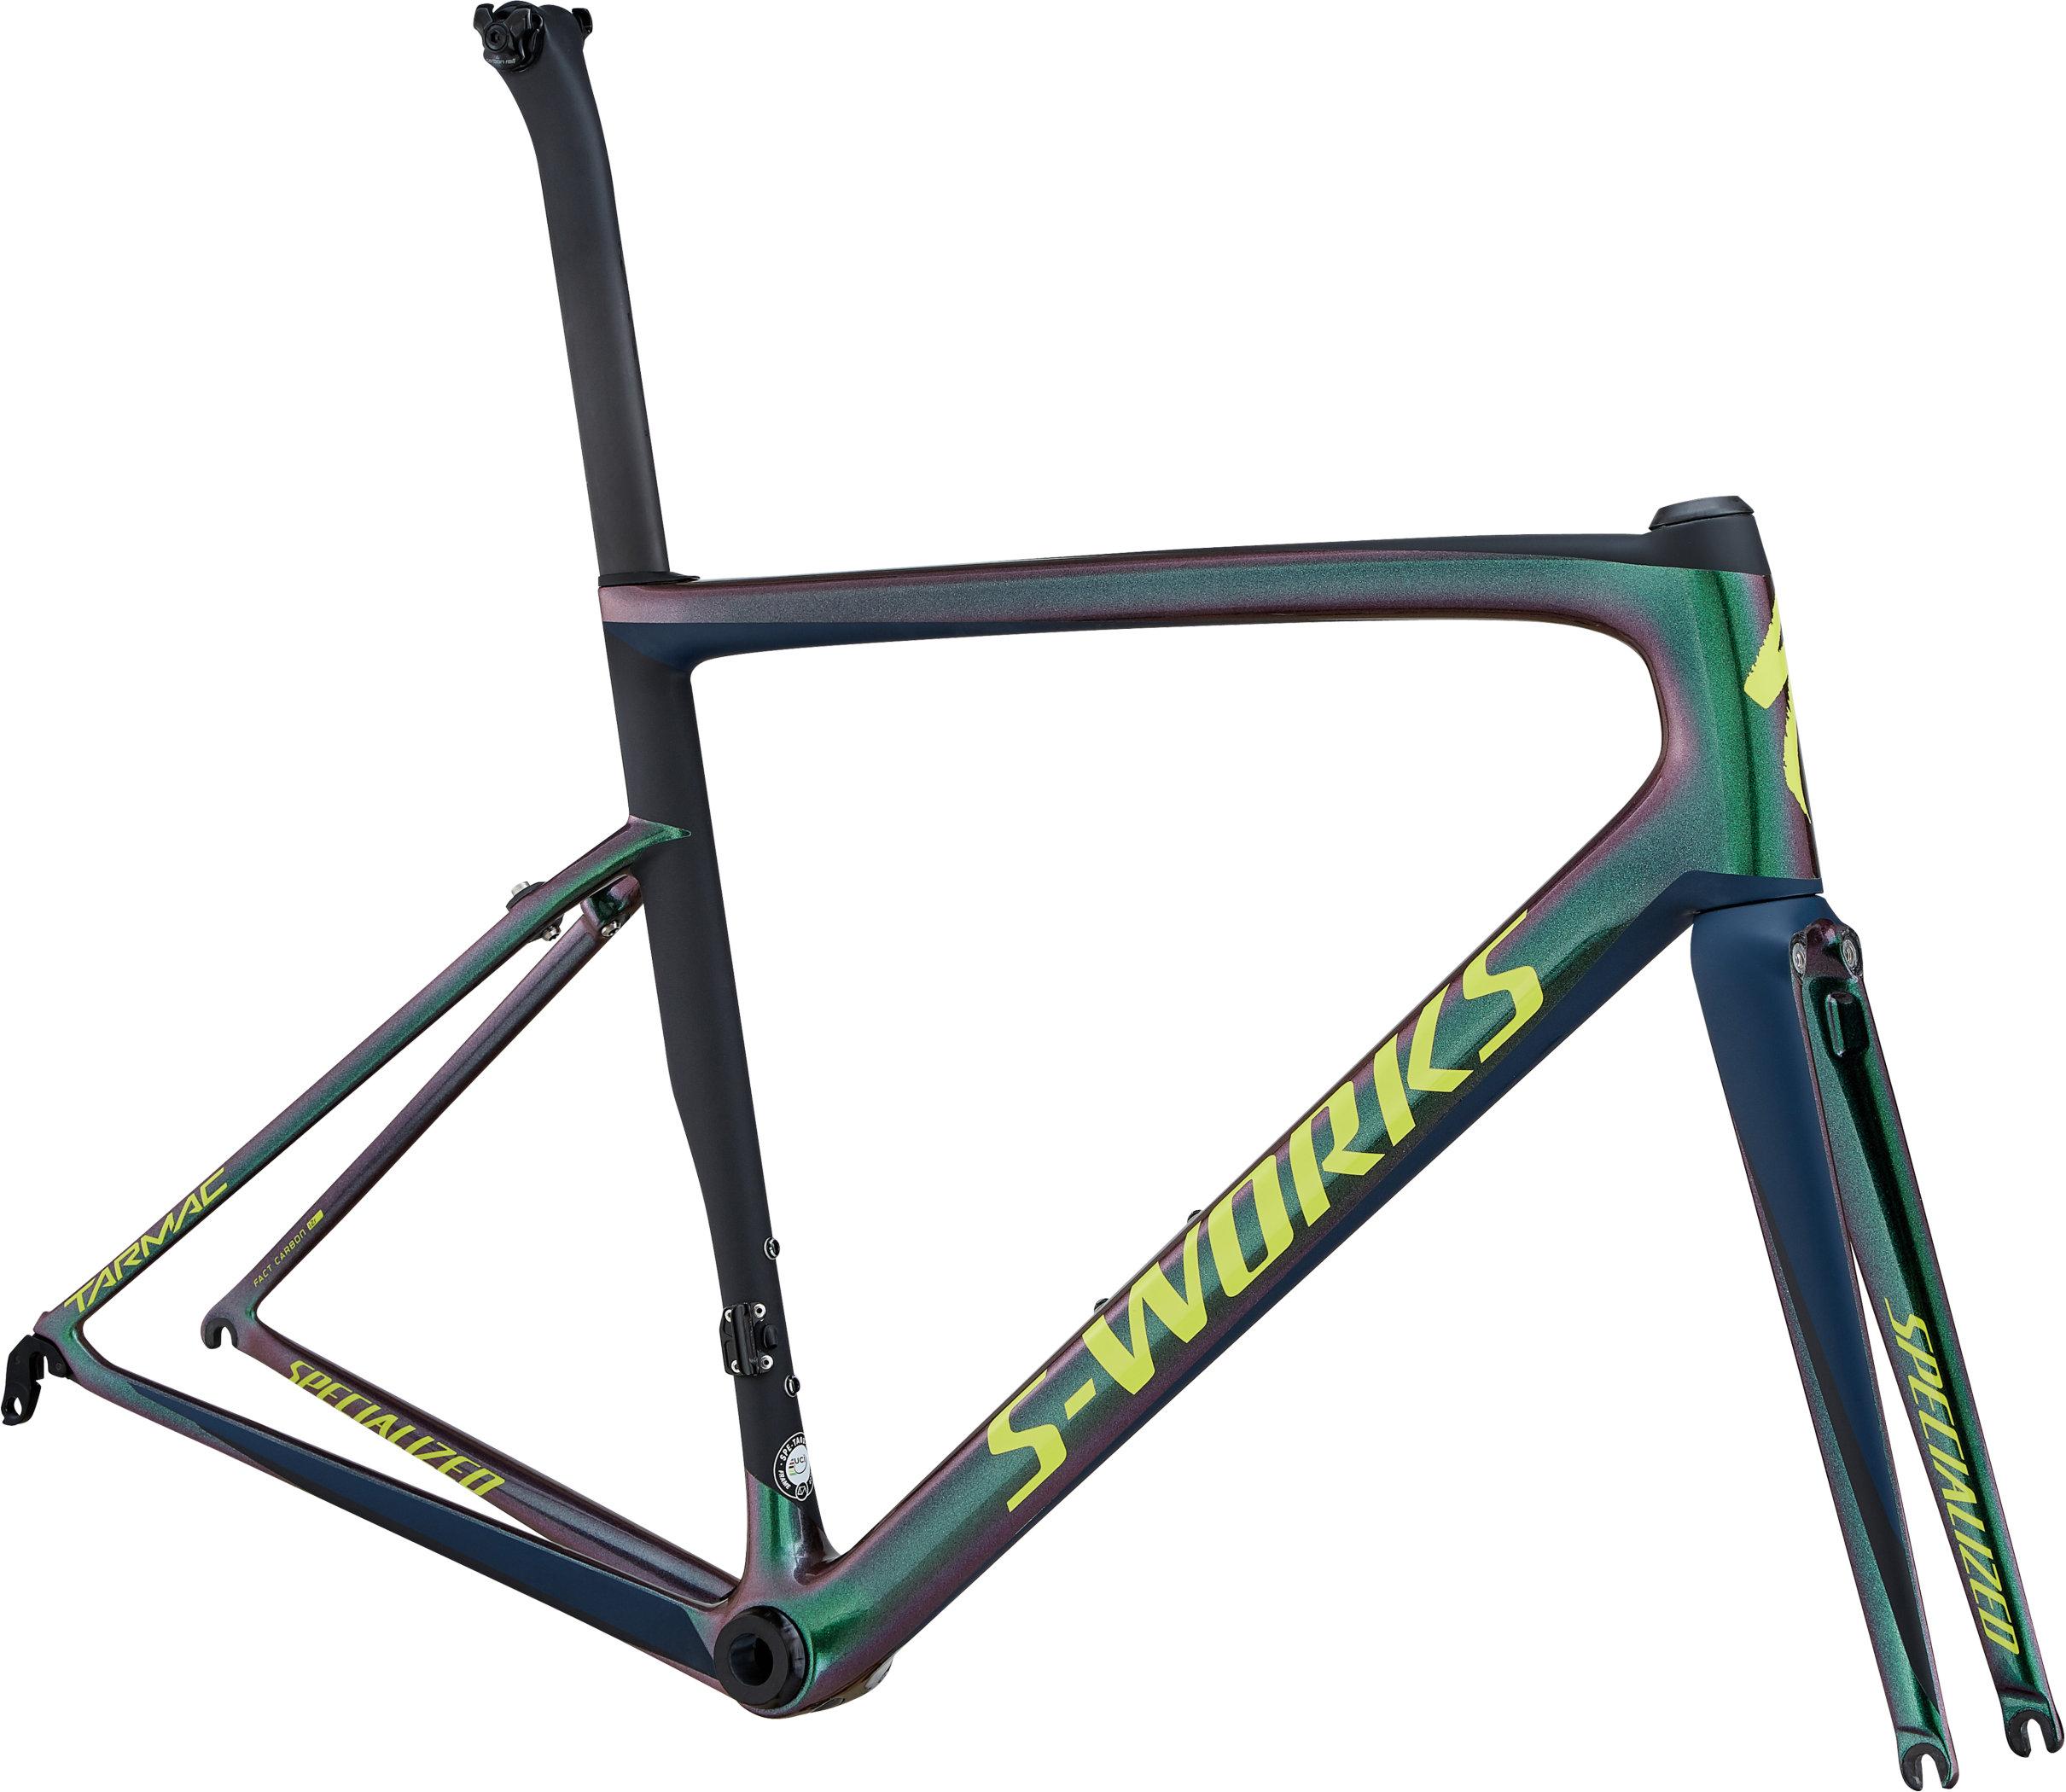 Specialized S-Works Tarmac Frameset Chameleon Green/Satin Cast Blue/Black/Team Yellow 49 - Pulsschlag Bike+Sport